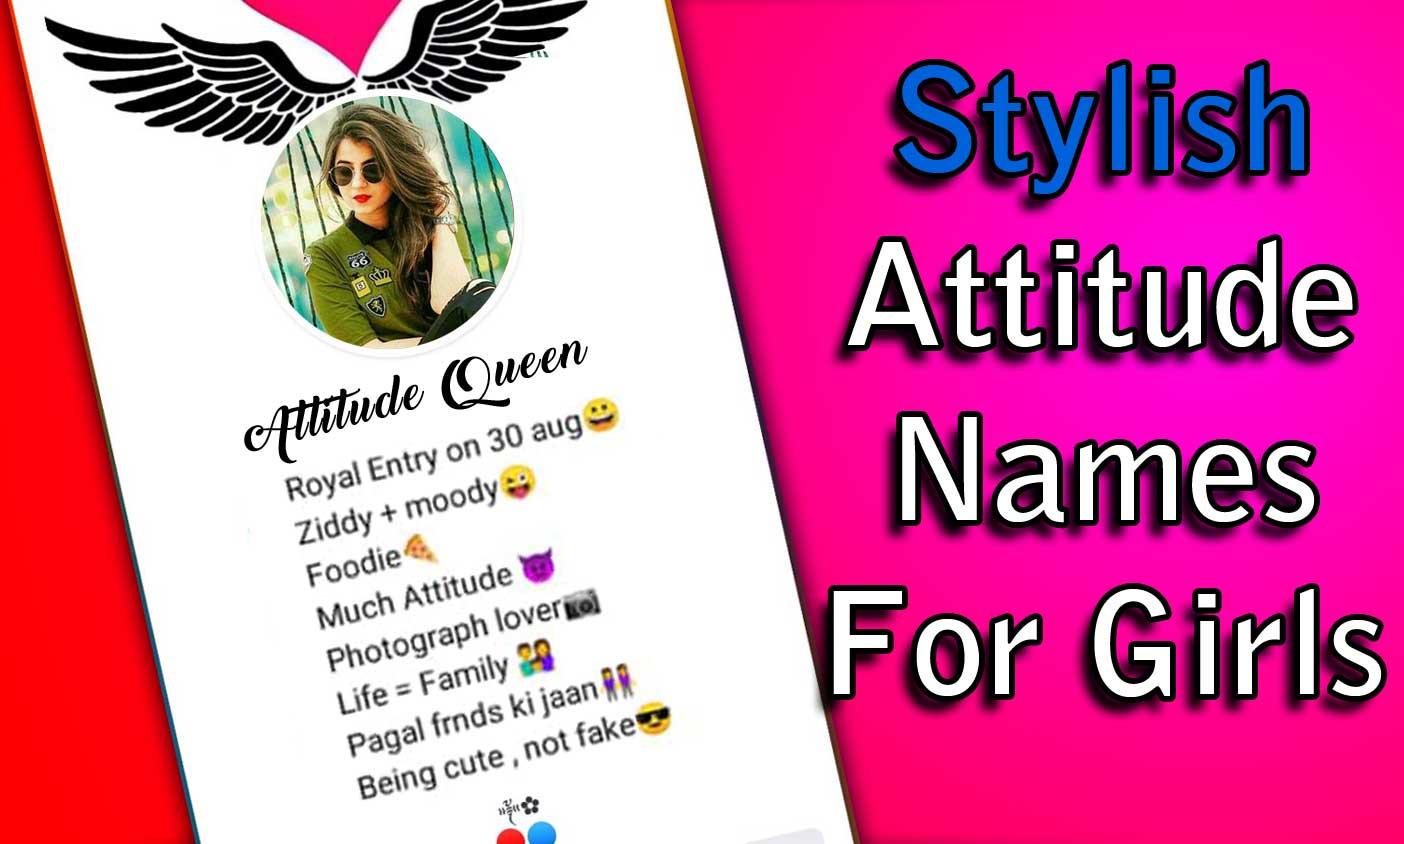 Stylish attitude names for girls